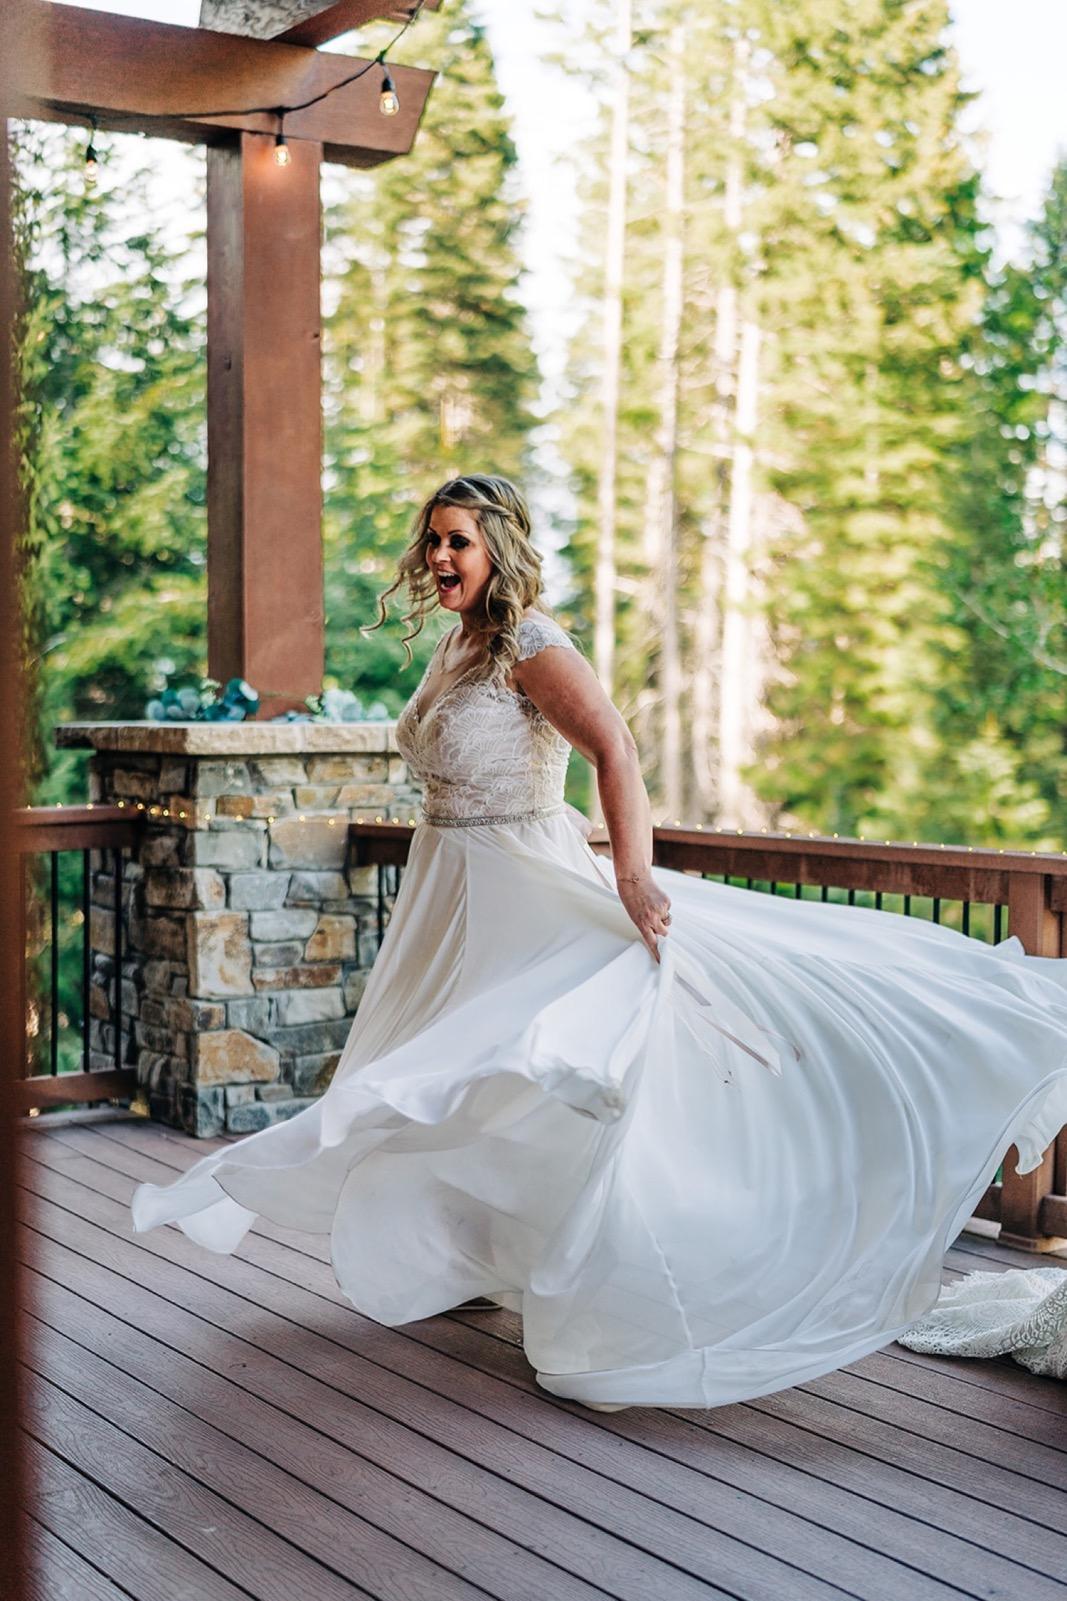 148_falissa_heather_wedding-456.jpg